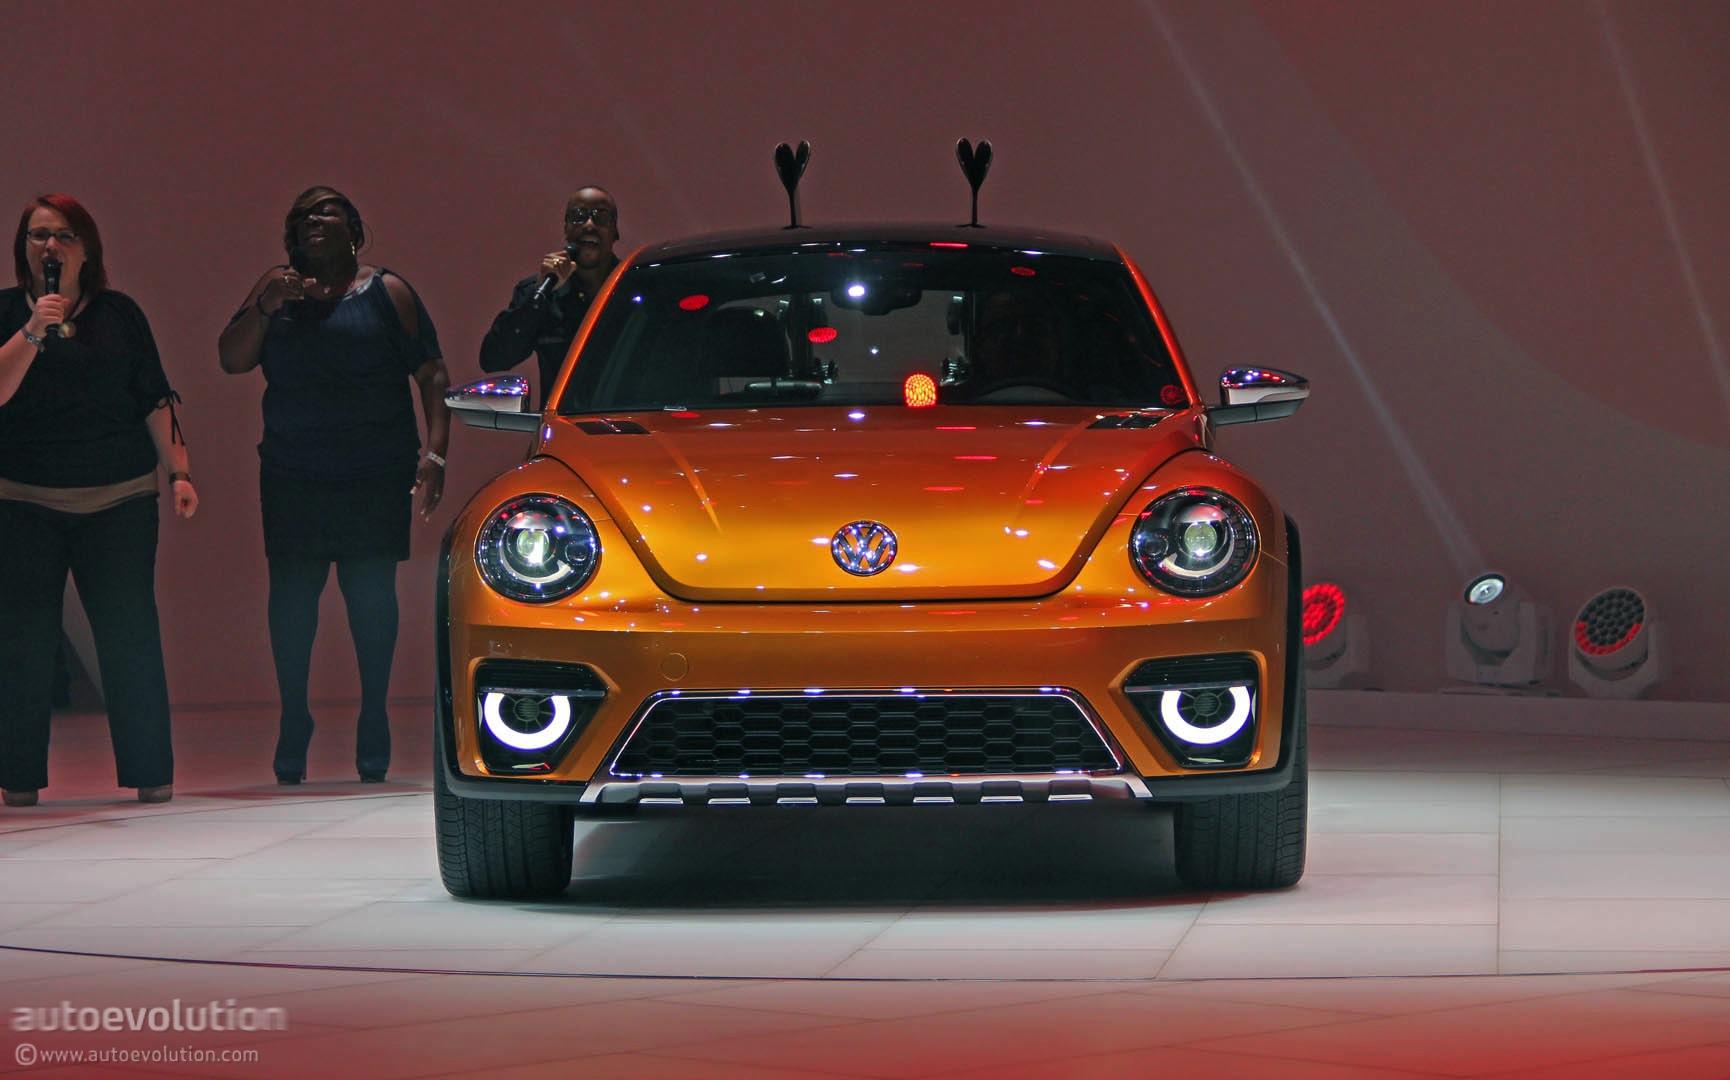 VW Beetle Dune Concept Is an Alltrack Bug [Live Photos] - autoevolution